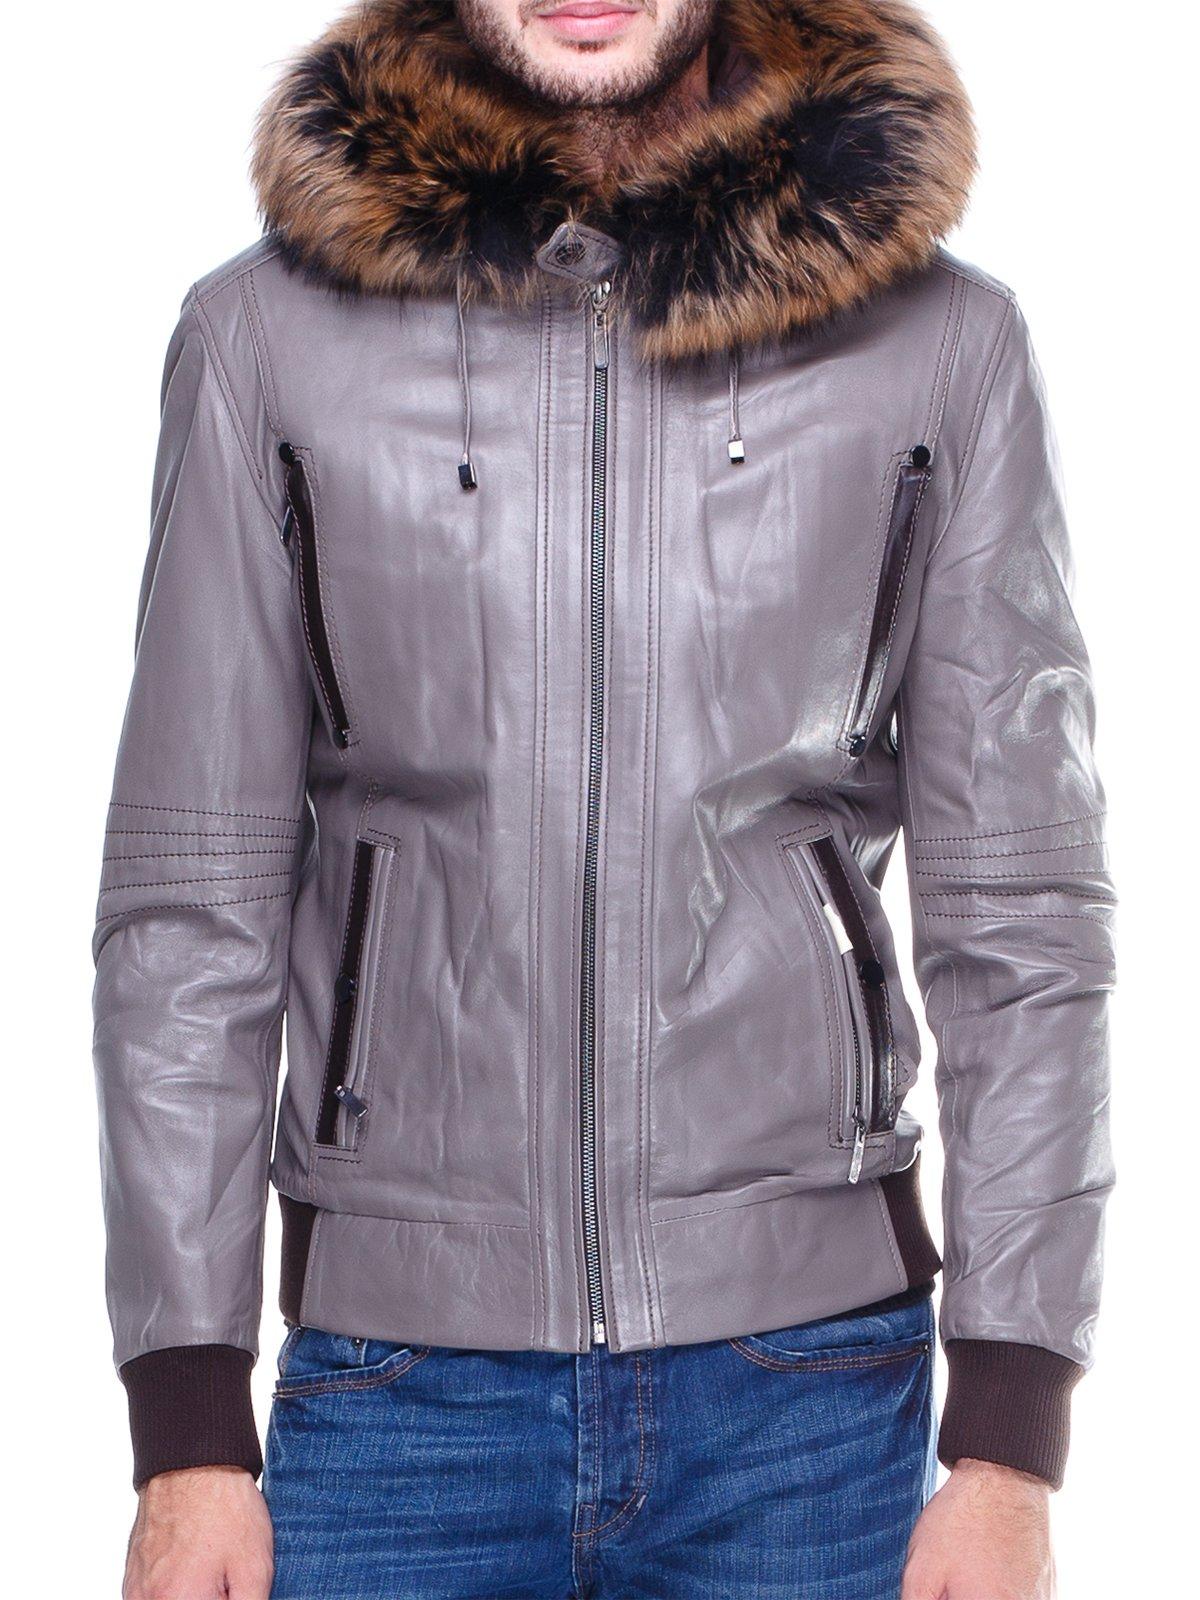 Куртка сіра з оздобленим хутром капюшоном   1830354   фото 3